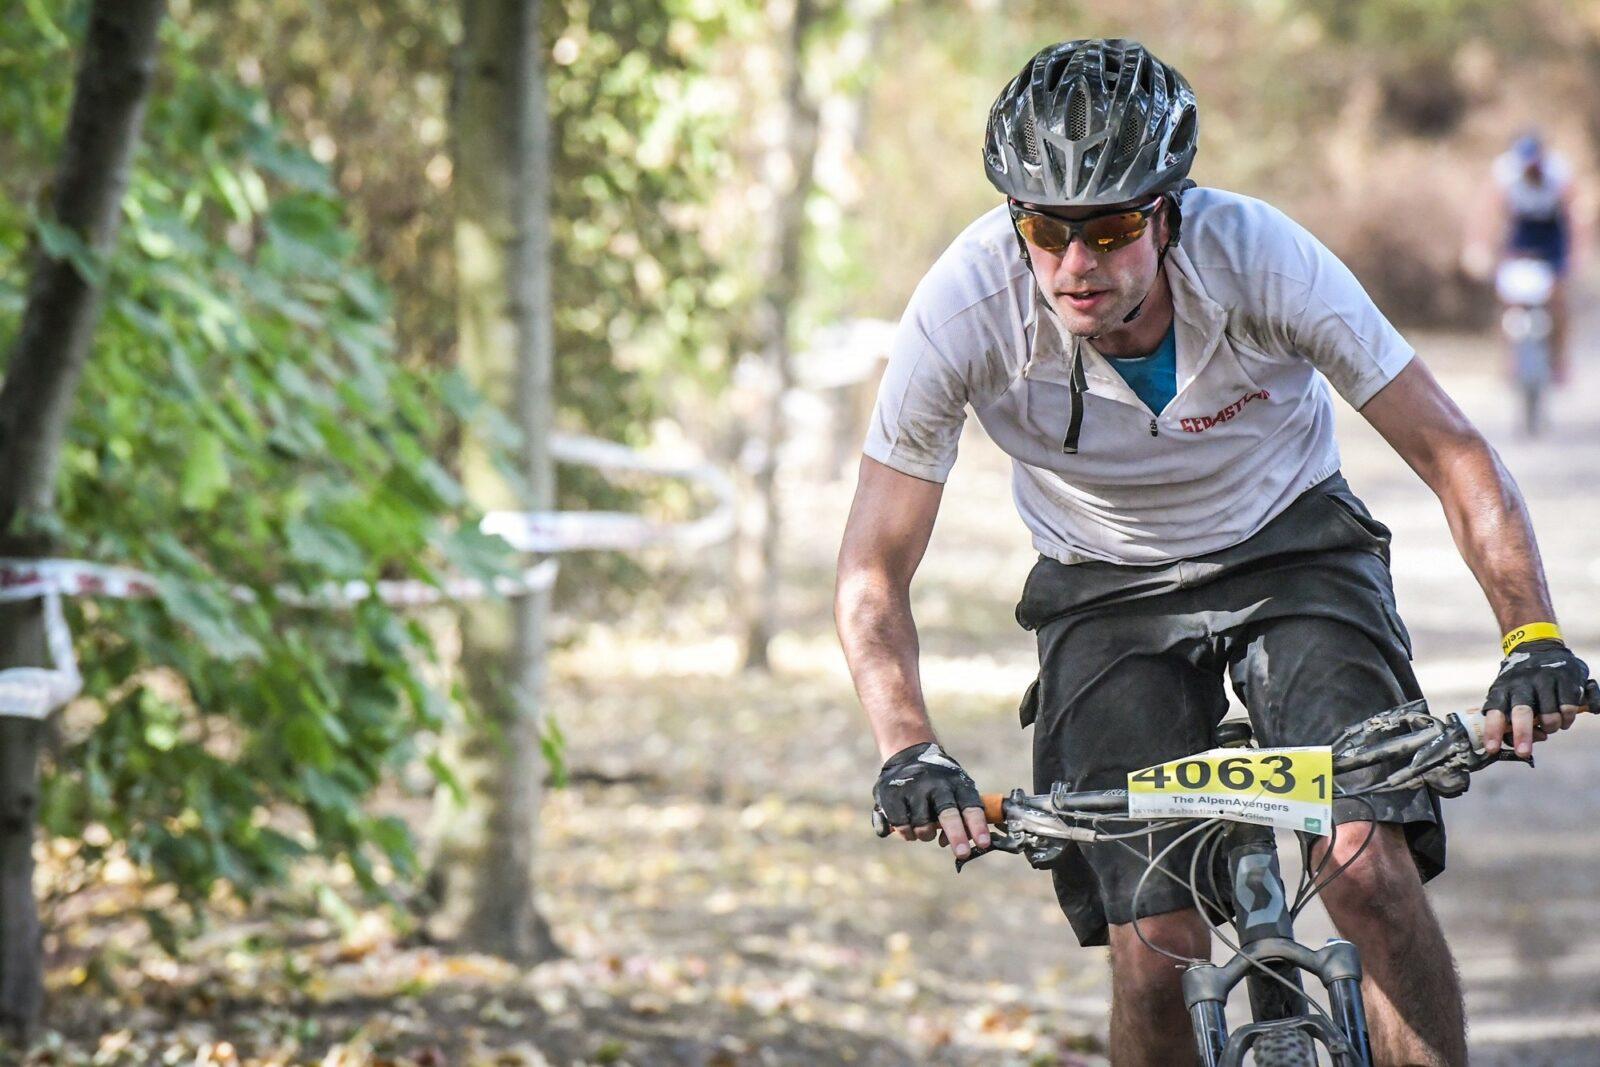 Sebastian Bike Profil 7